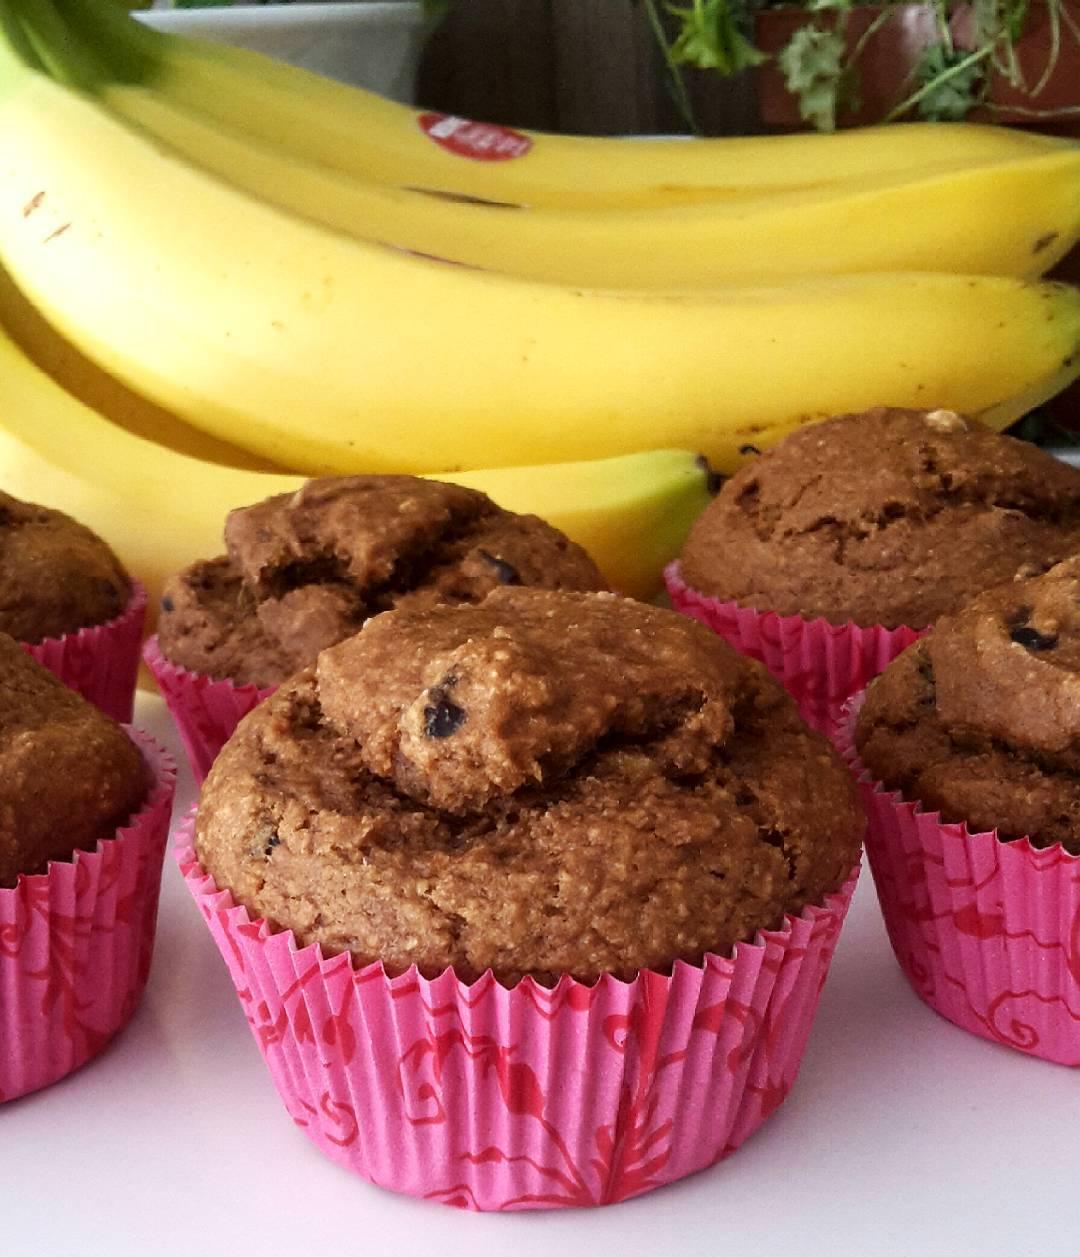 blueberry banana bran muffins by @claras_keksfabrik